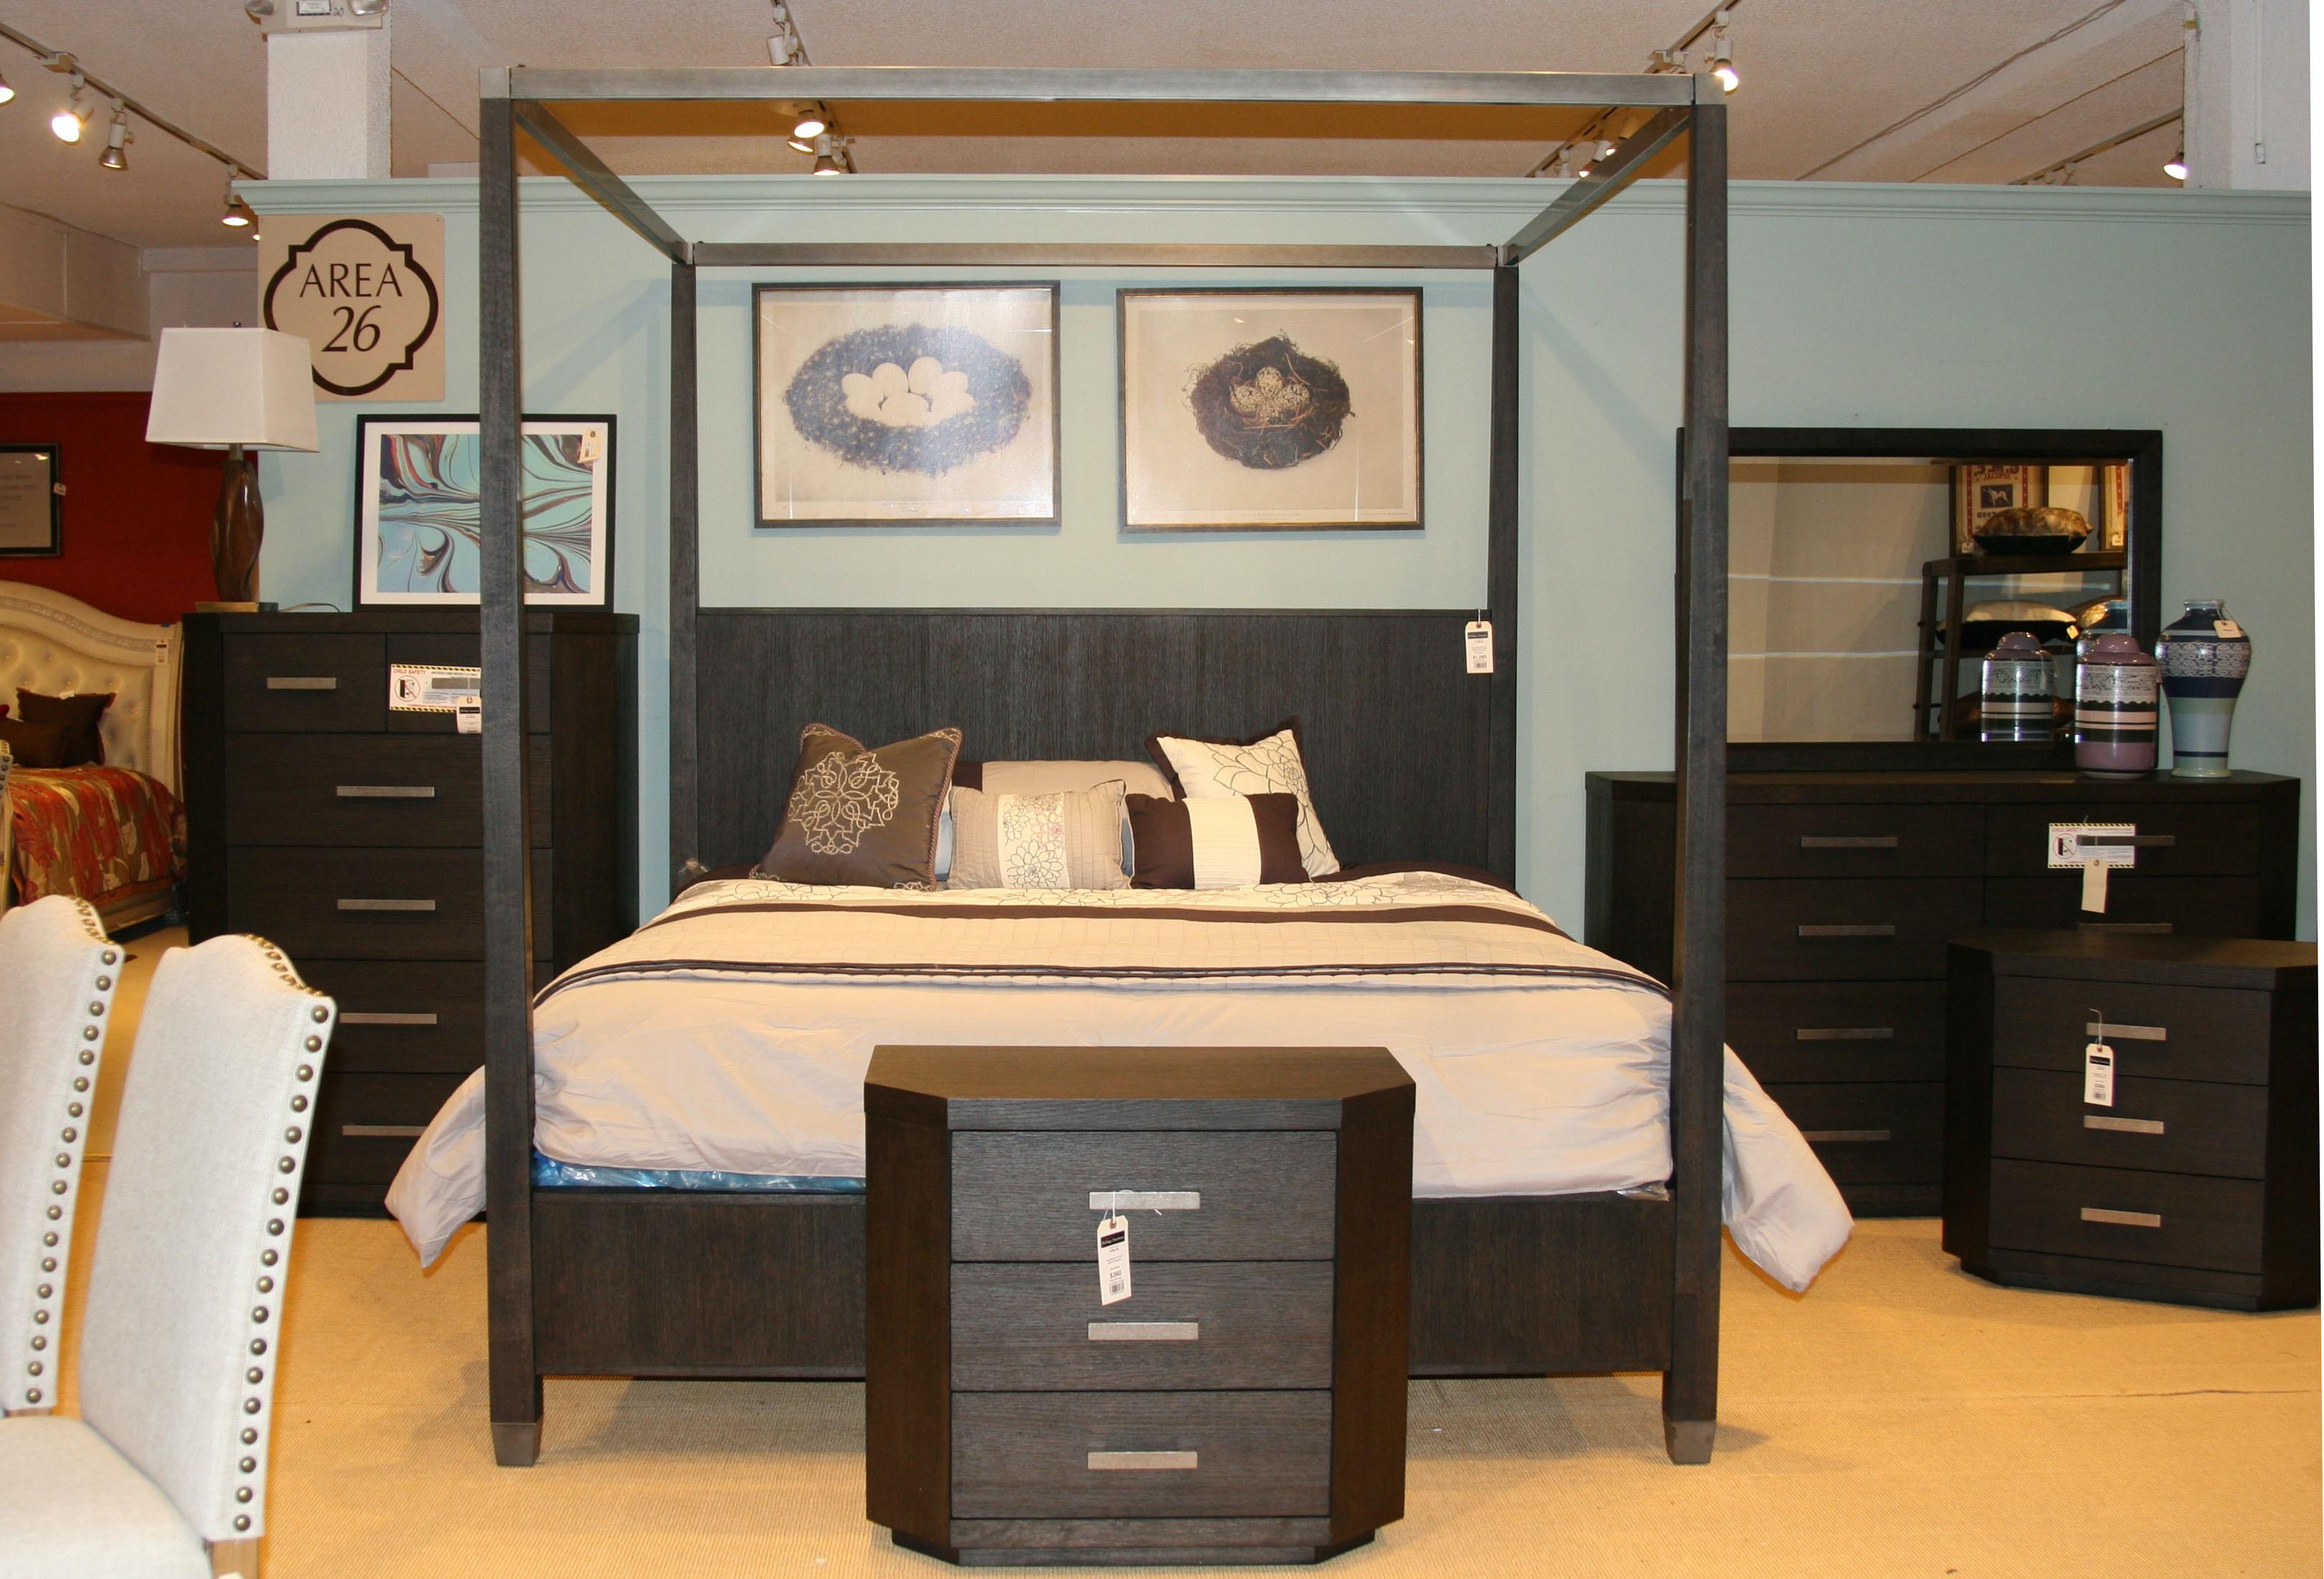 Bedroom Furniture Hickory Nc bedroom beds | furniture | hickory furniture mart in hickory, nc